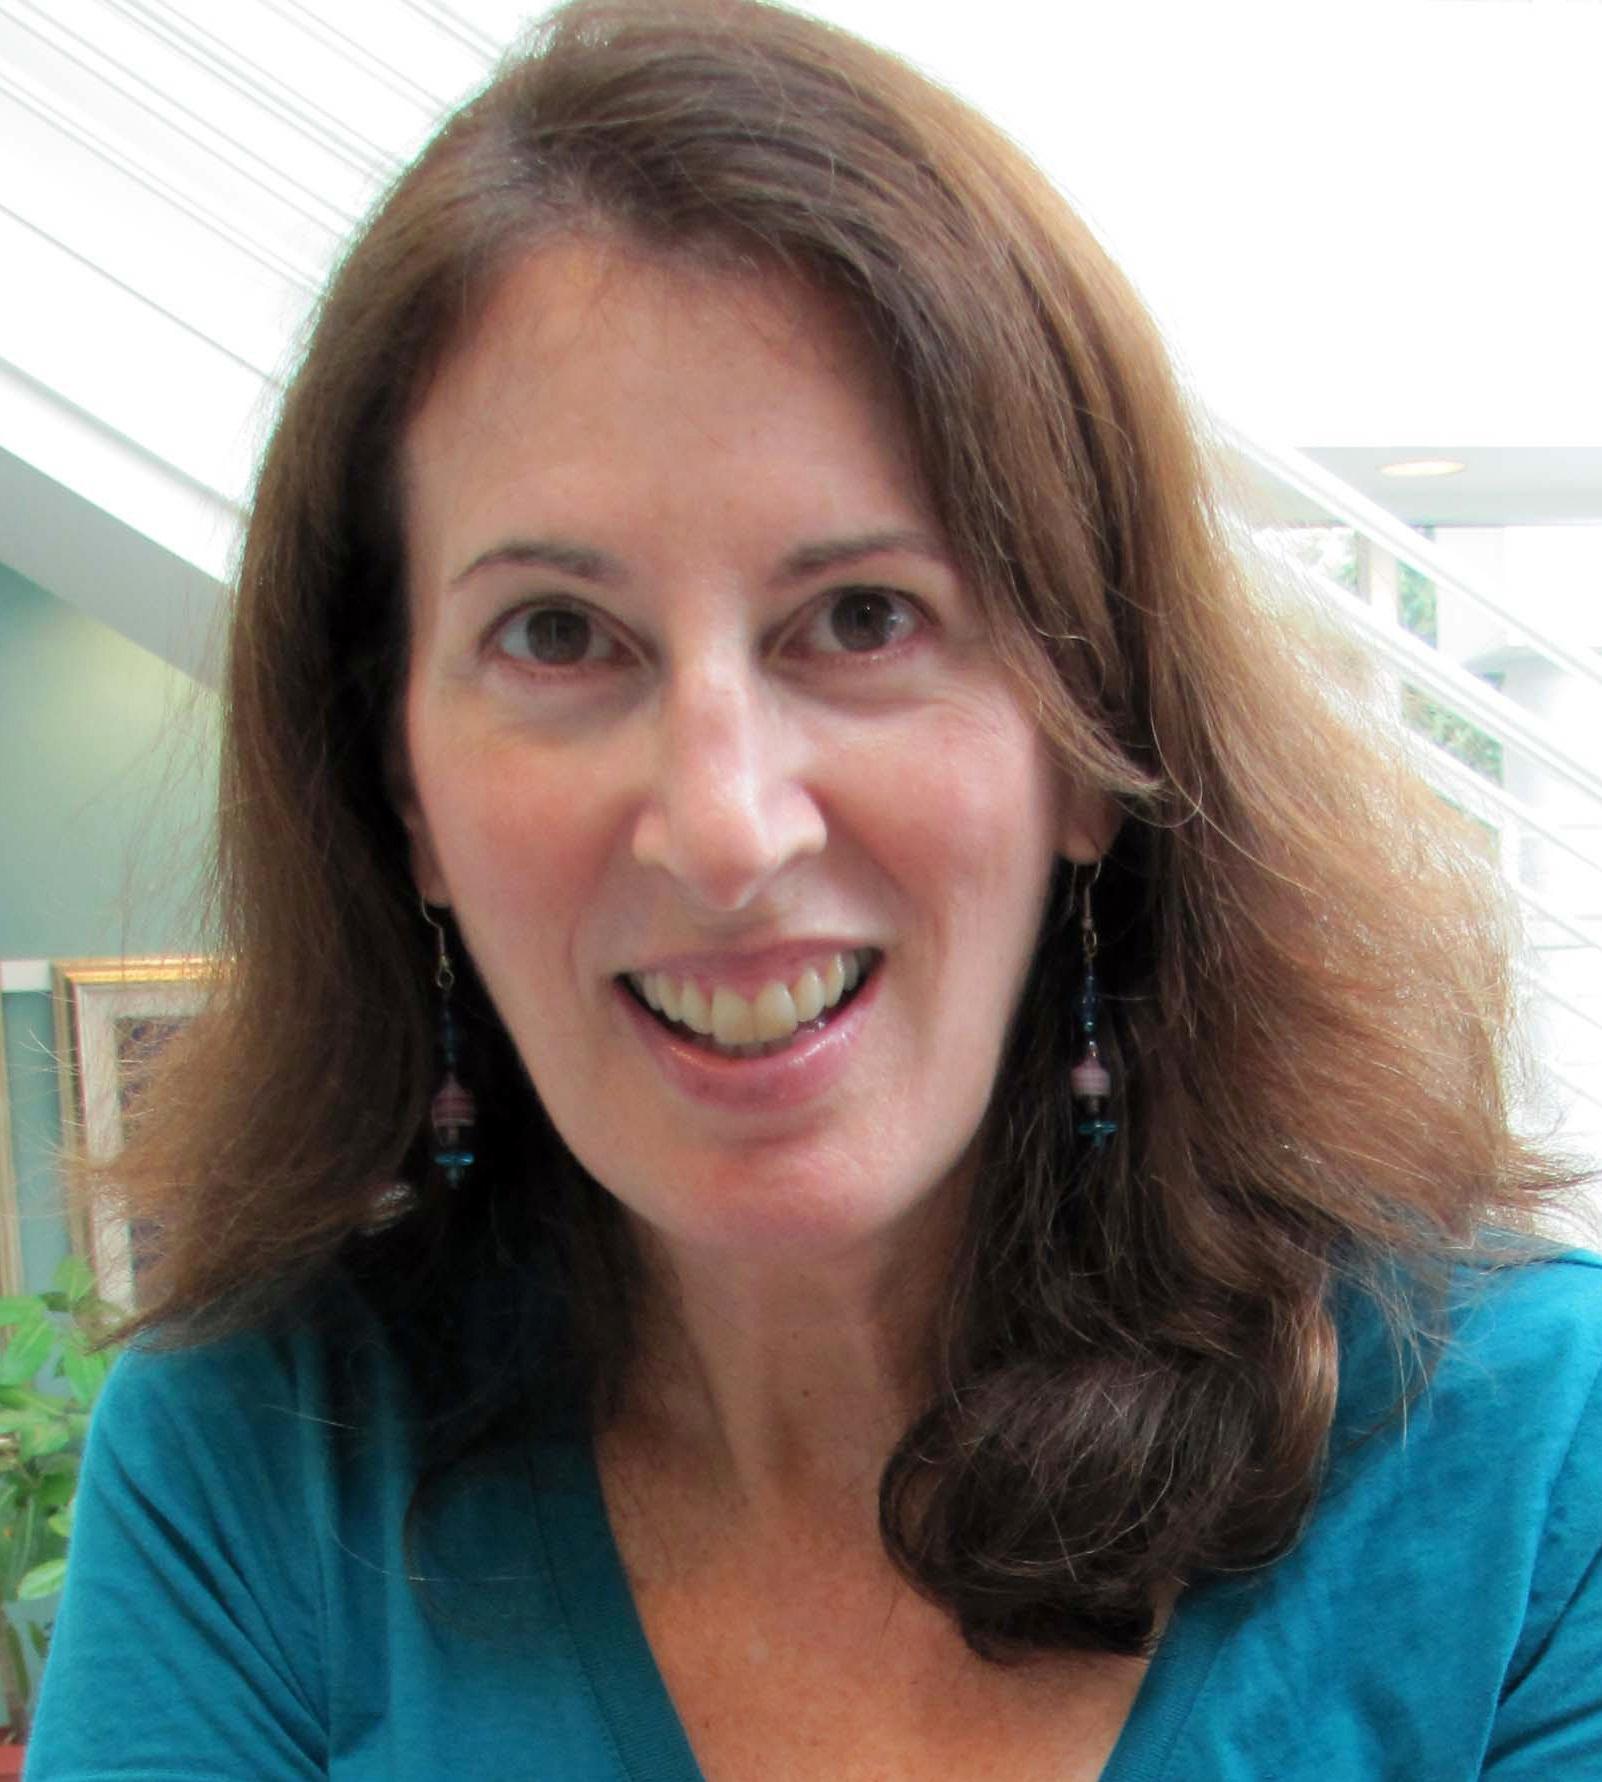 Rhonda Sherman - Vermicomposting Expert and Author of The Worm Farmer's Handbook